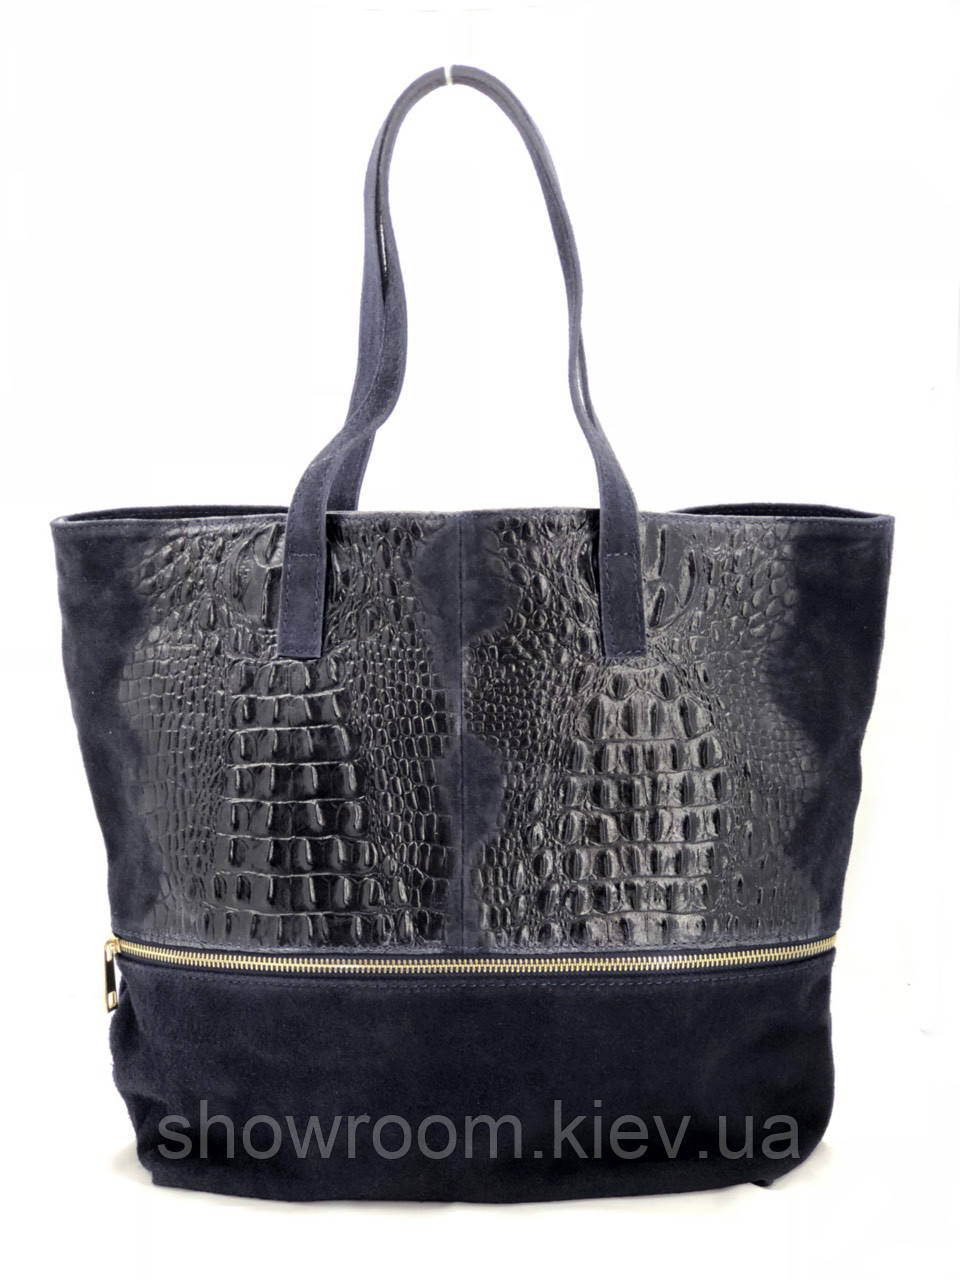 Сумка шоппер женская Vera Pelle (TS 80) кожаная темно синяя